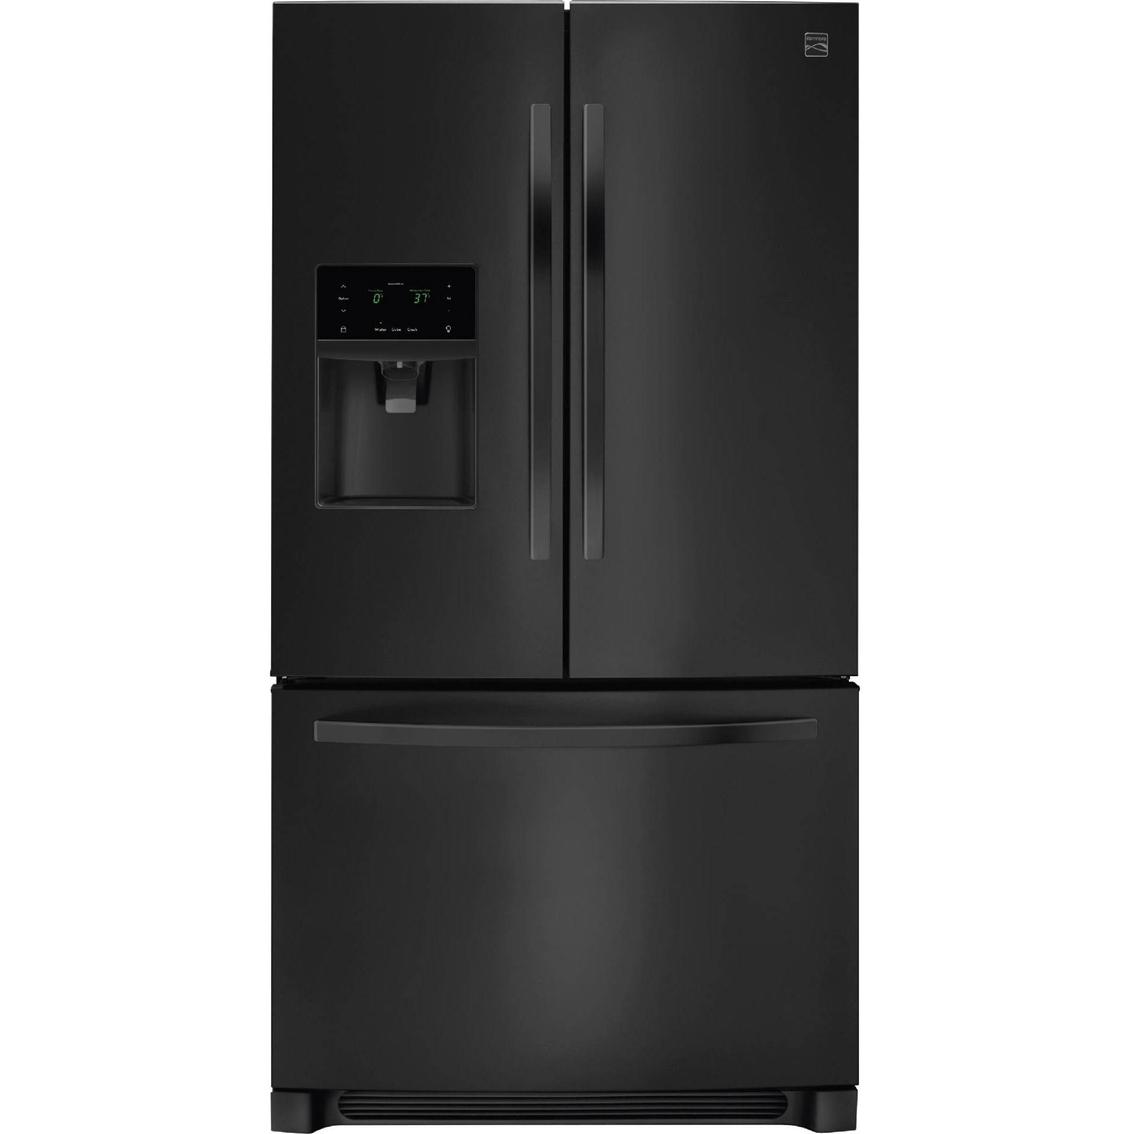 Kenmore 27 2 cu ft french door refrigerator for 17 cu ft french door refrigerator